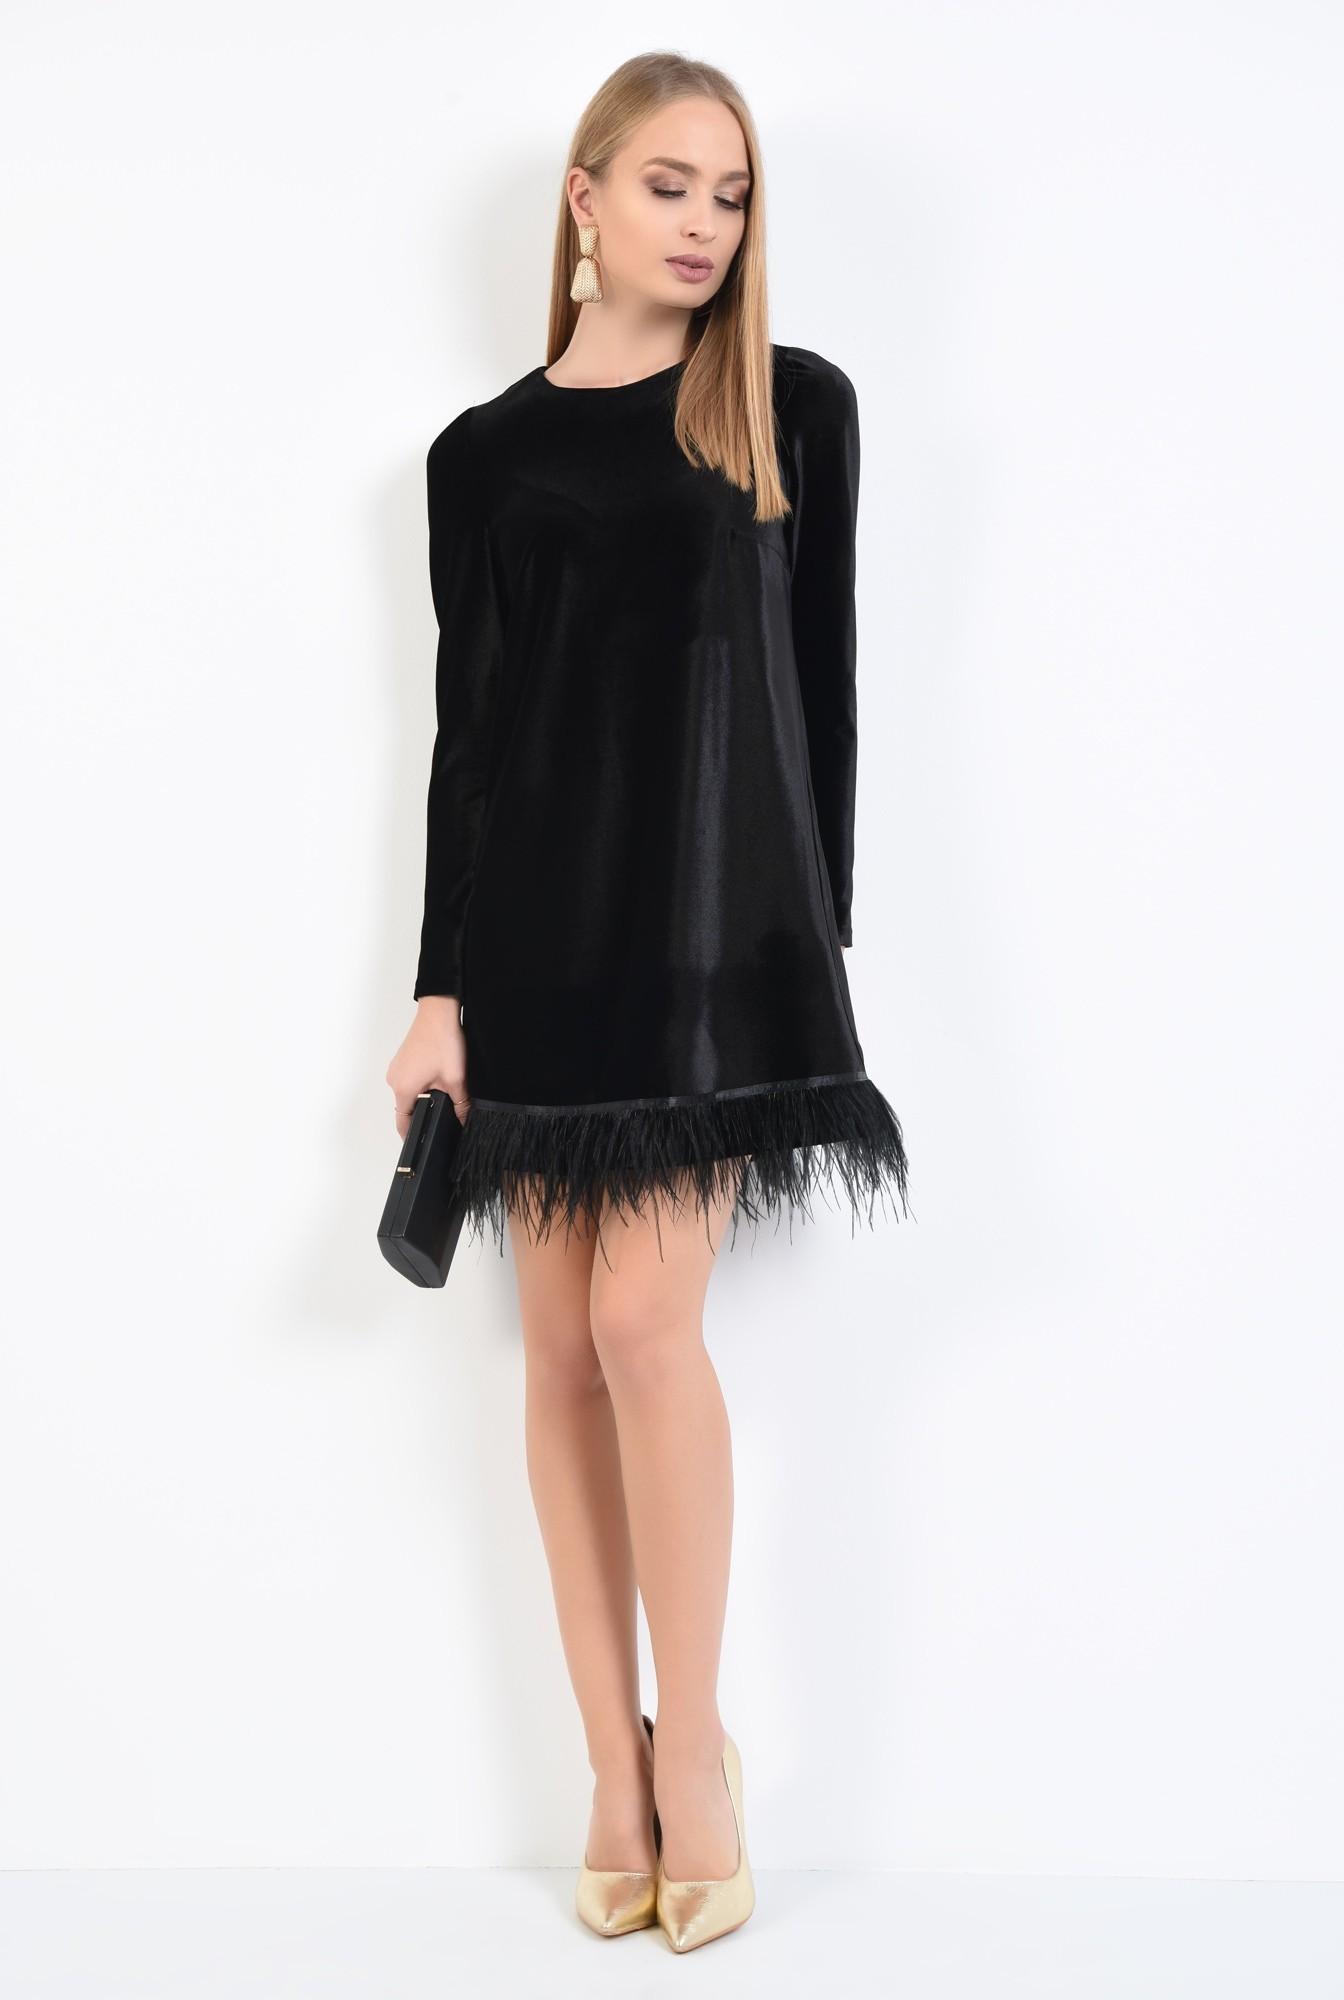 3 - rochie de seara, neagra, scurta, croi drept lejer, bordura din pene